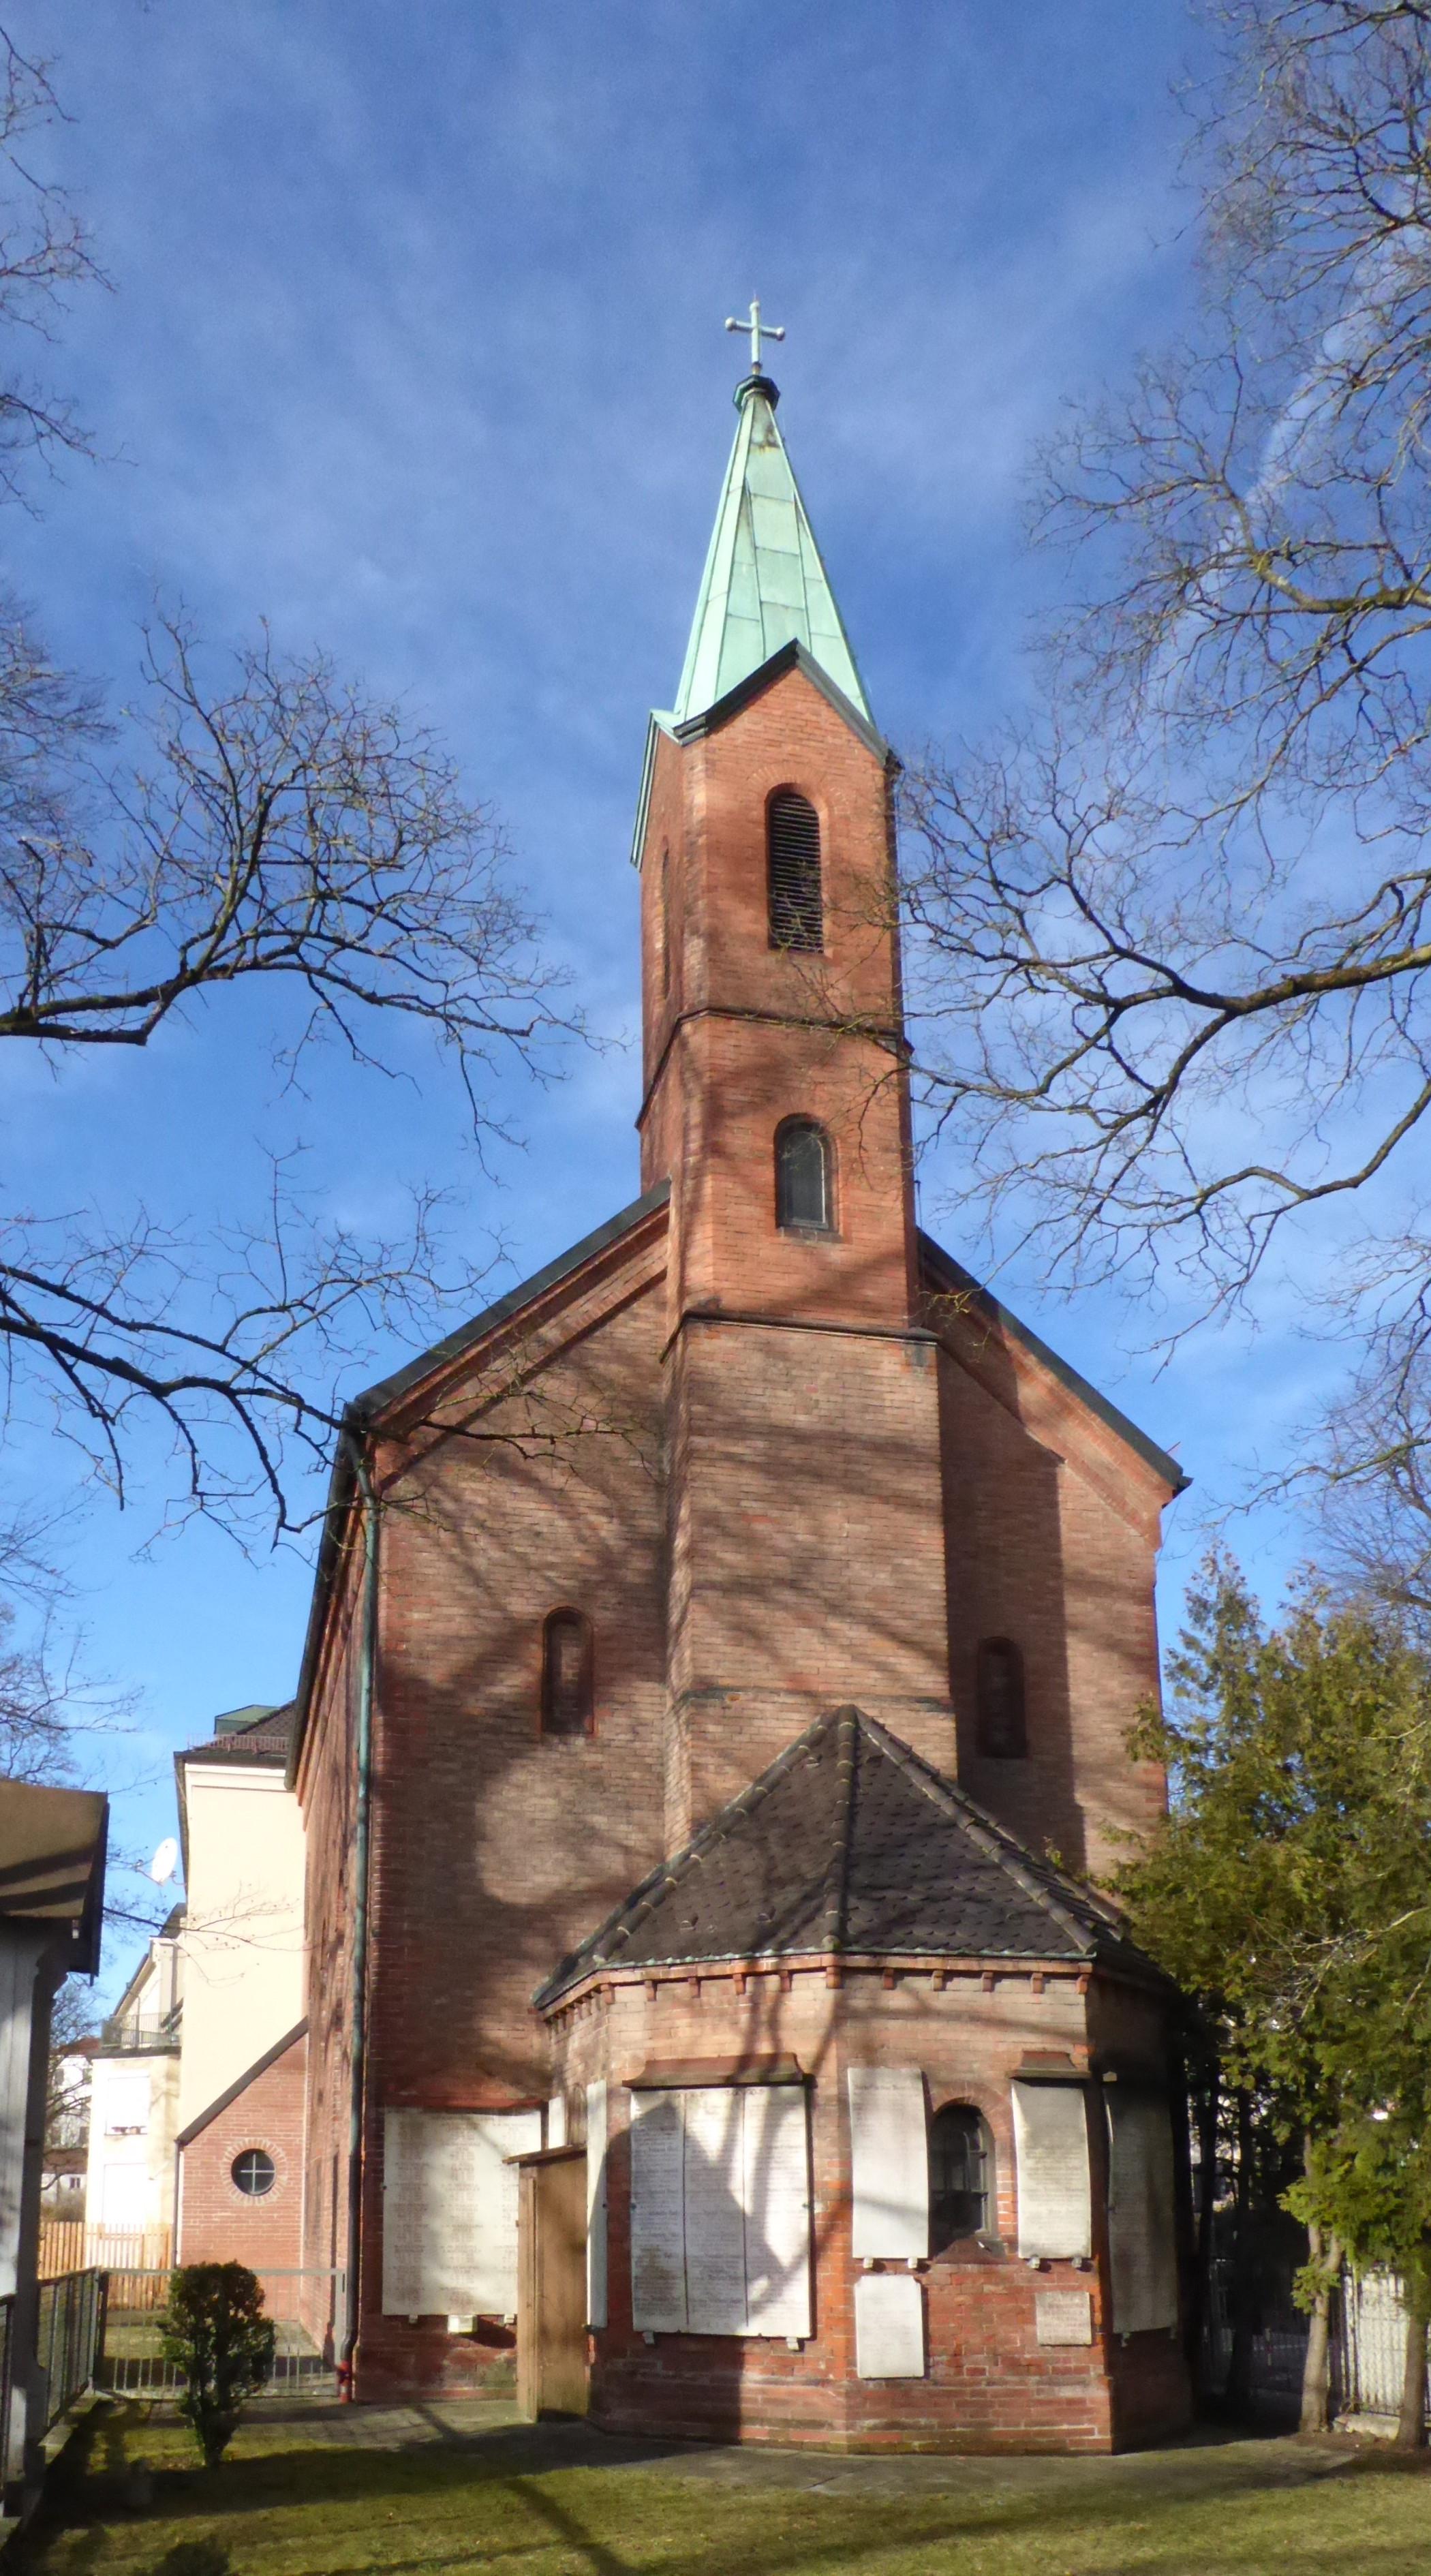 File:St. Mina koptisch-orthodoxe Kirche, Loretokapelle, 8